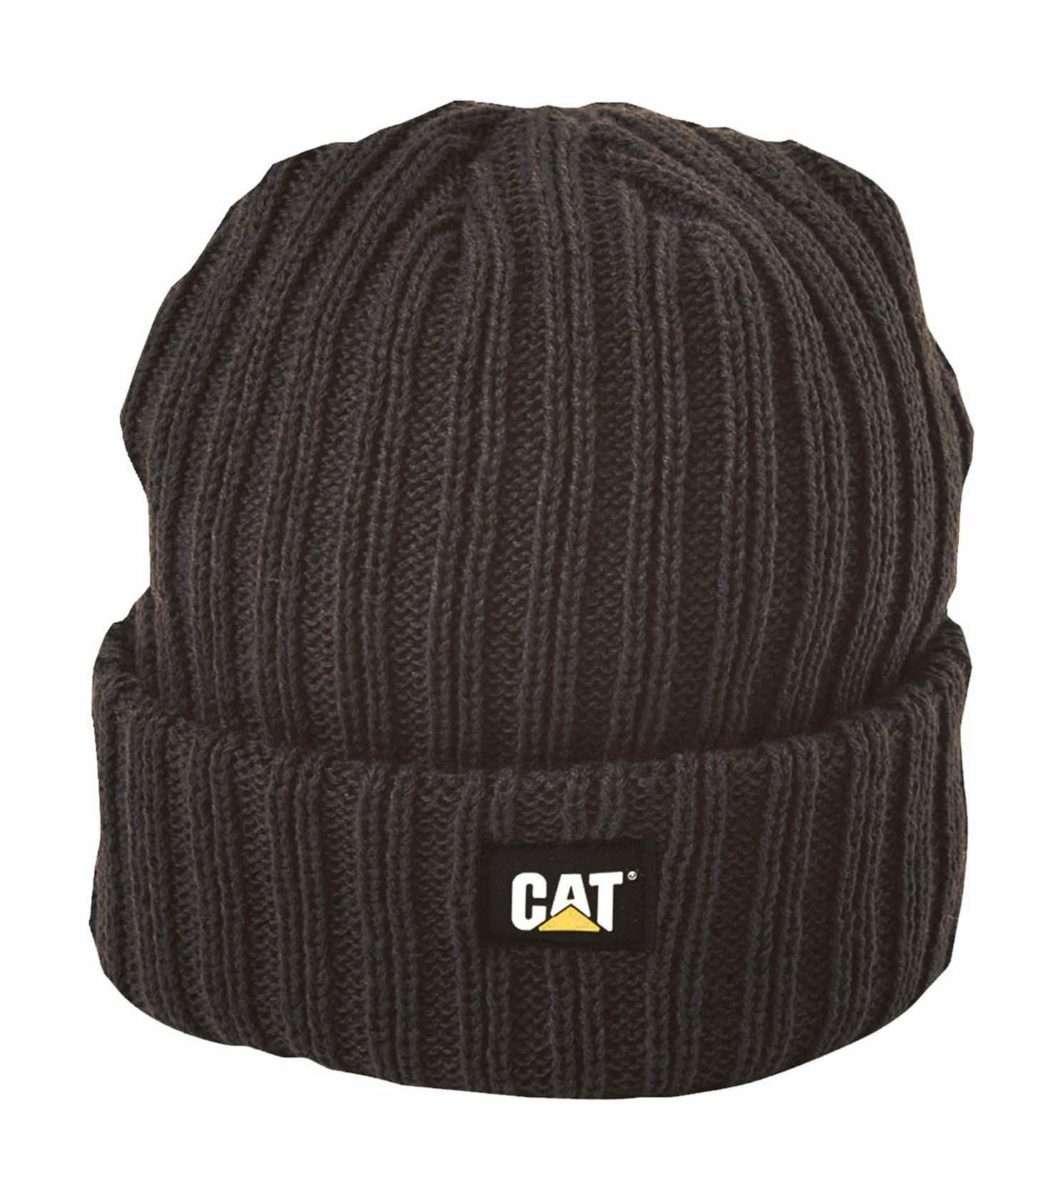 CAT Rib Watch Cap Beanie